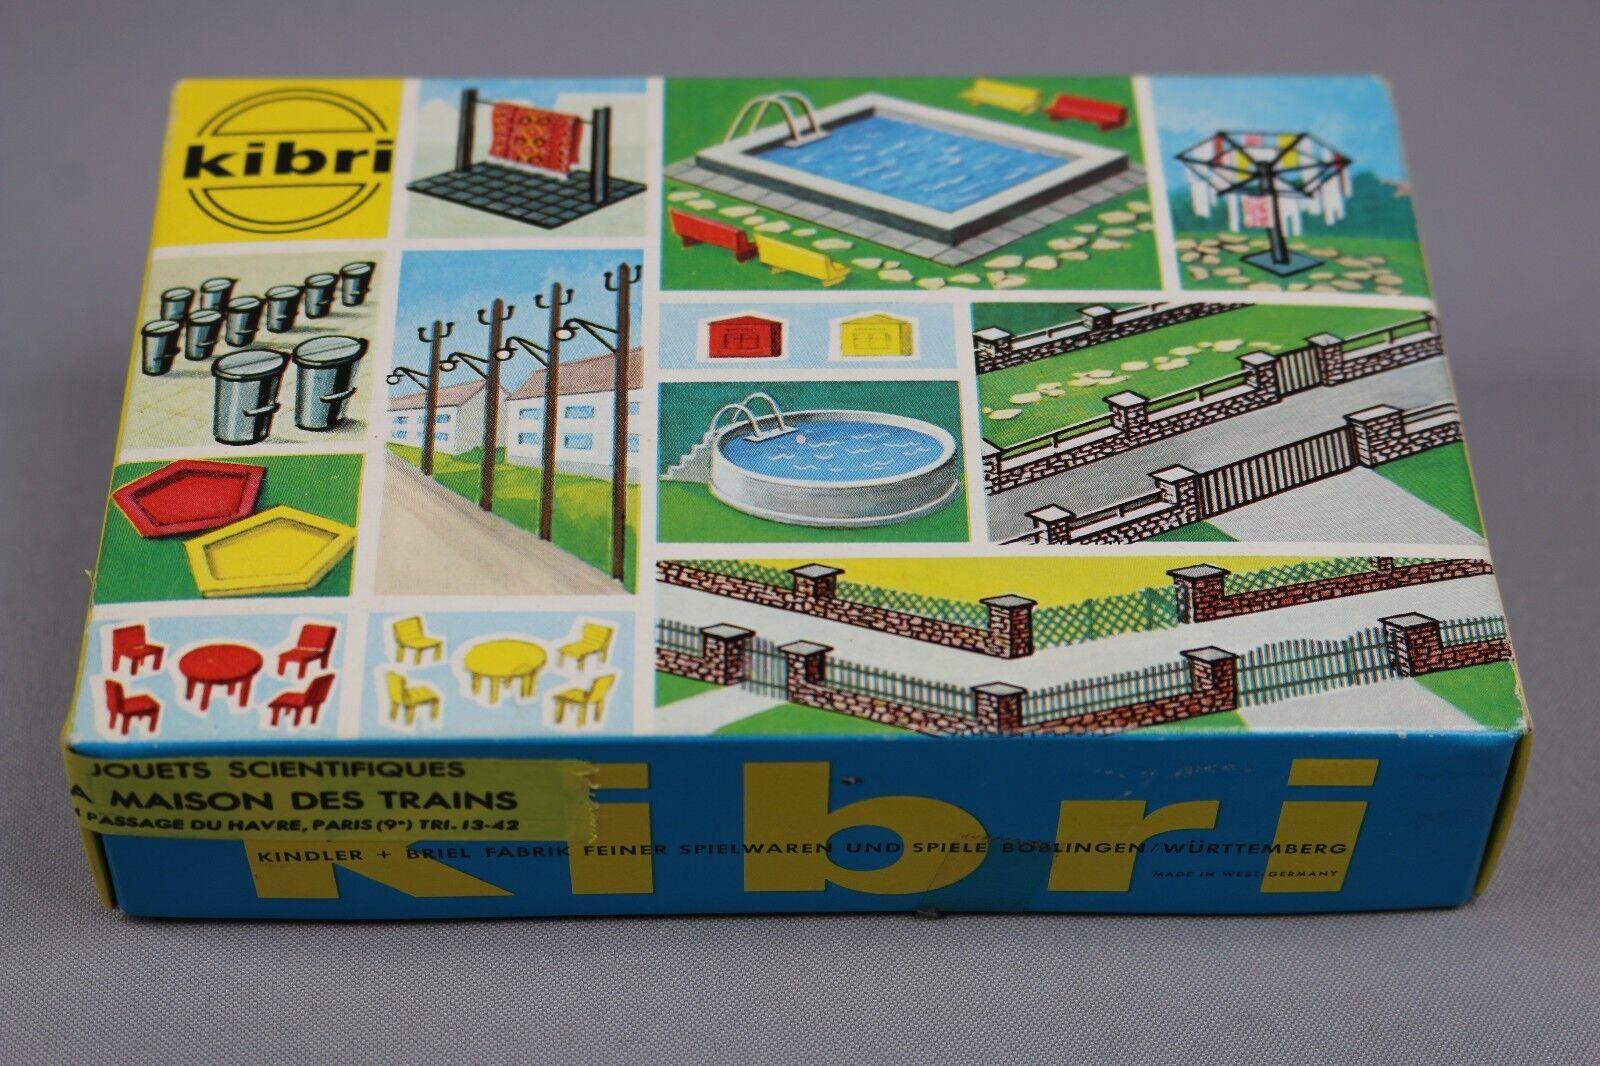 Z267 kibri oh train model 8092 decoration for home & garden diorama kit